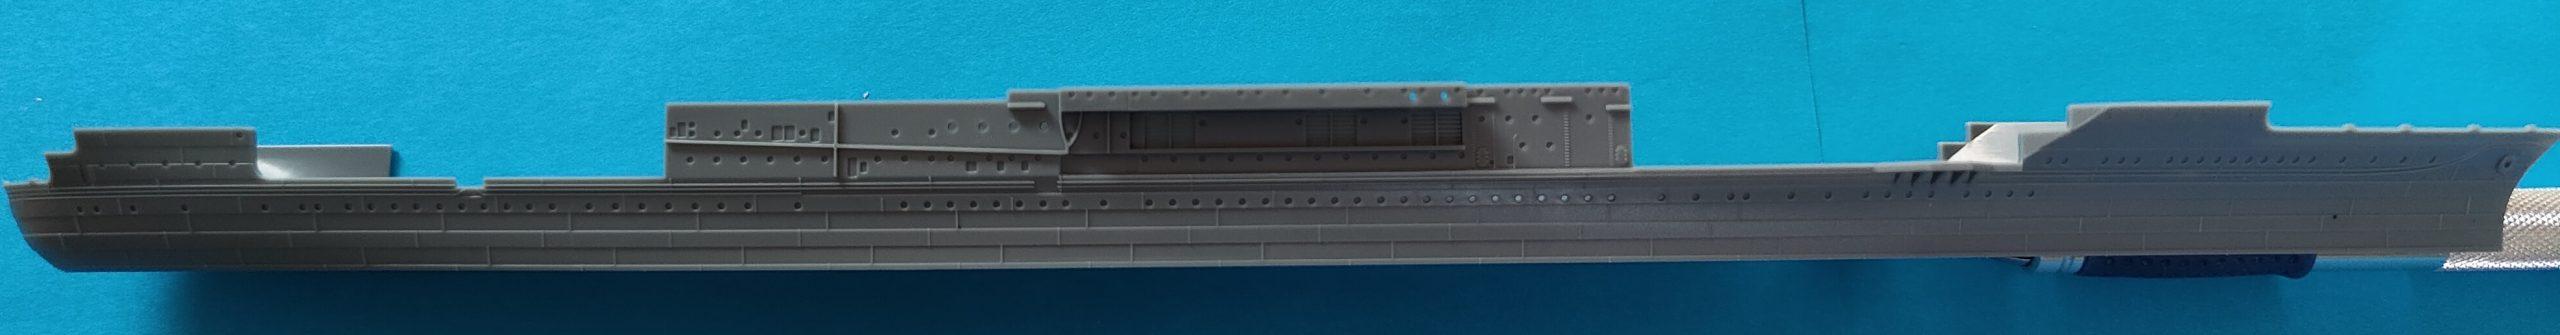 meng_enterprise012-scaled U.S. Navy aircraft carrier Enterprise (CV-6) in 1:700 von Meng